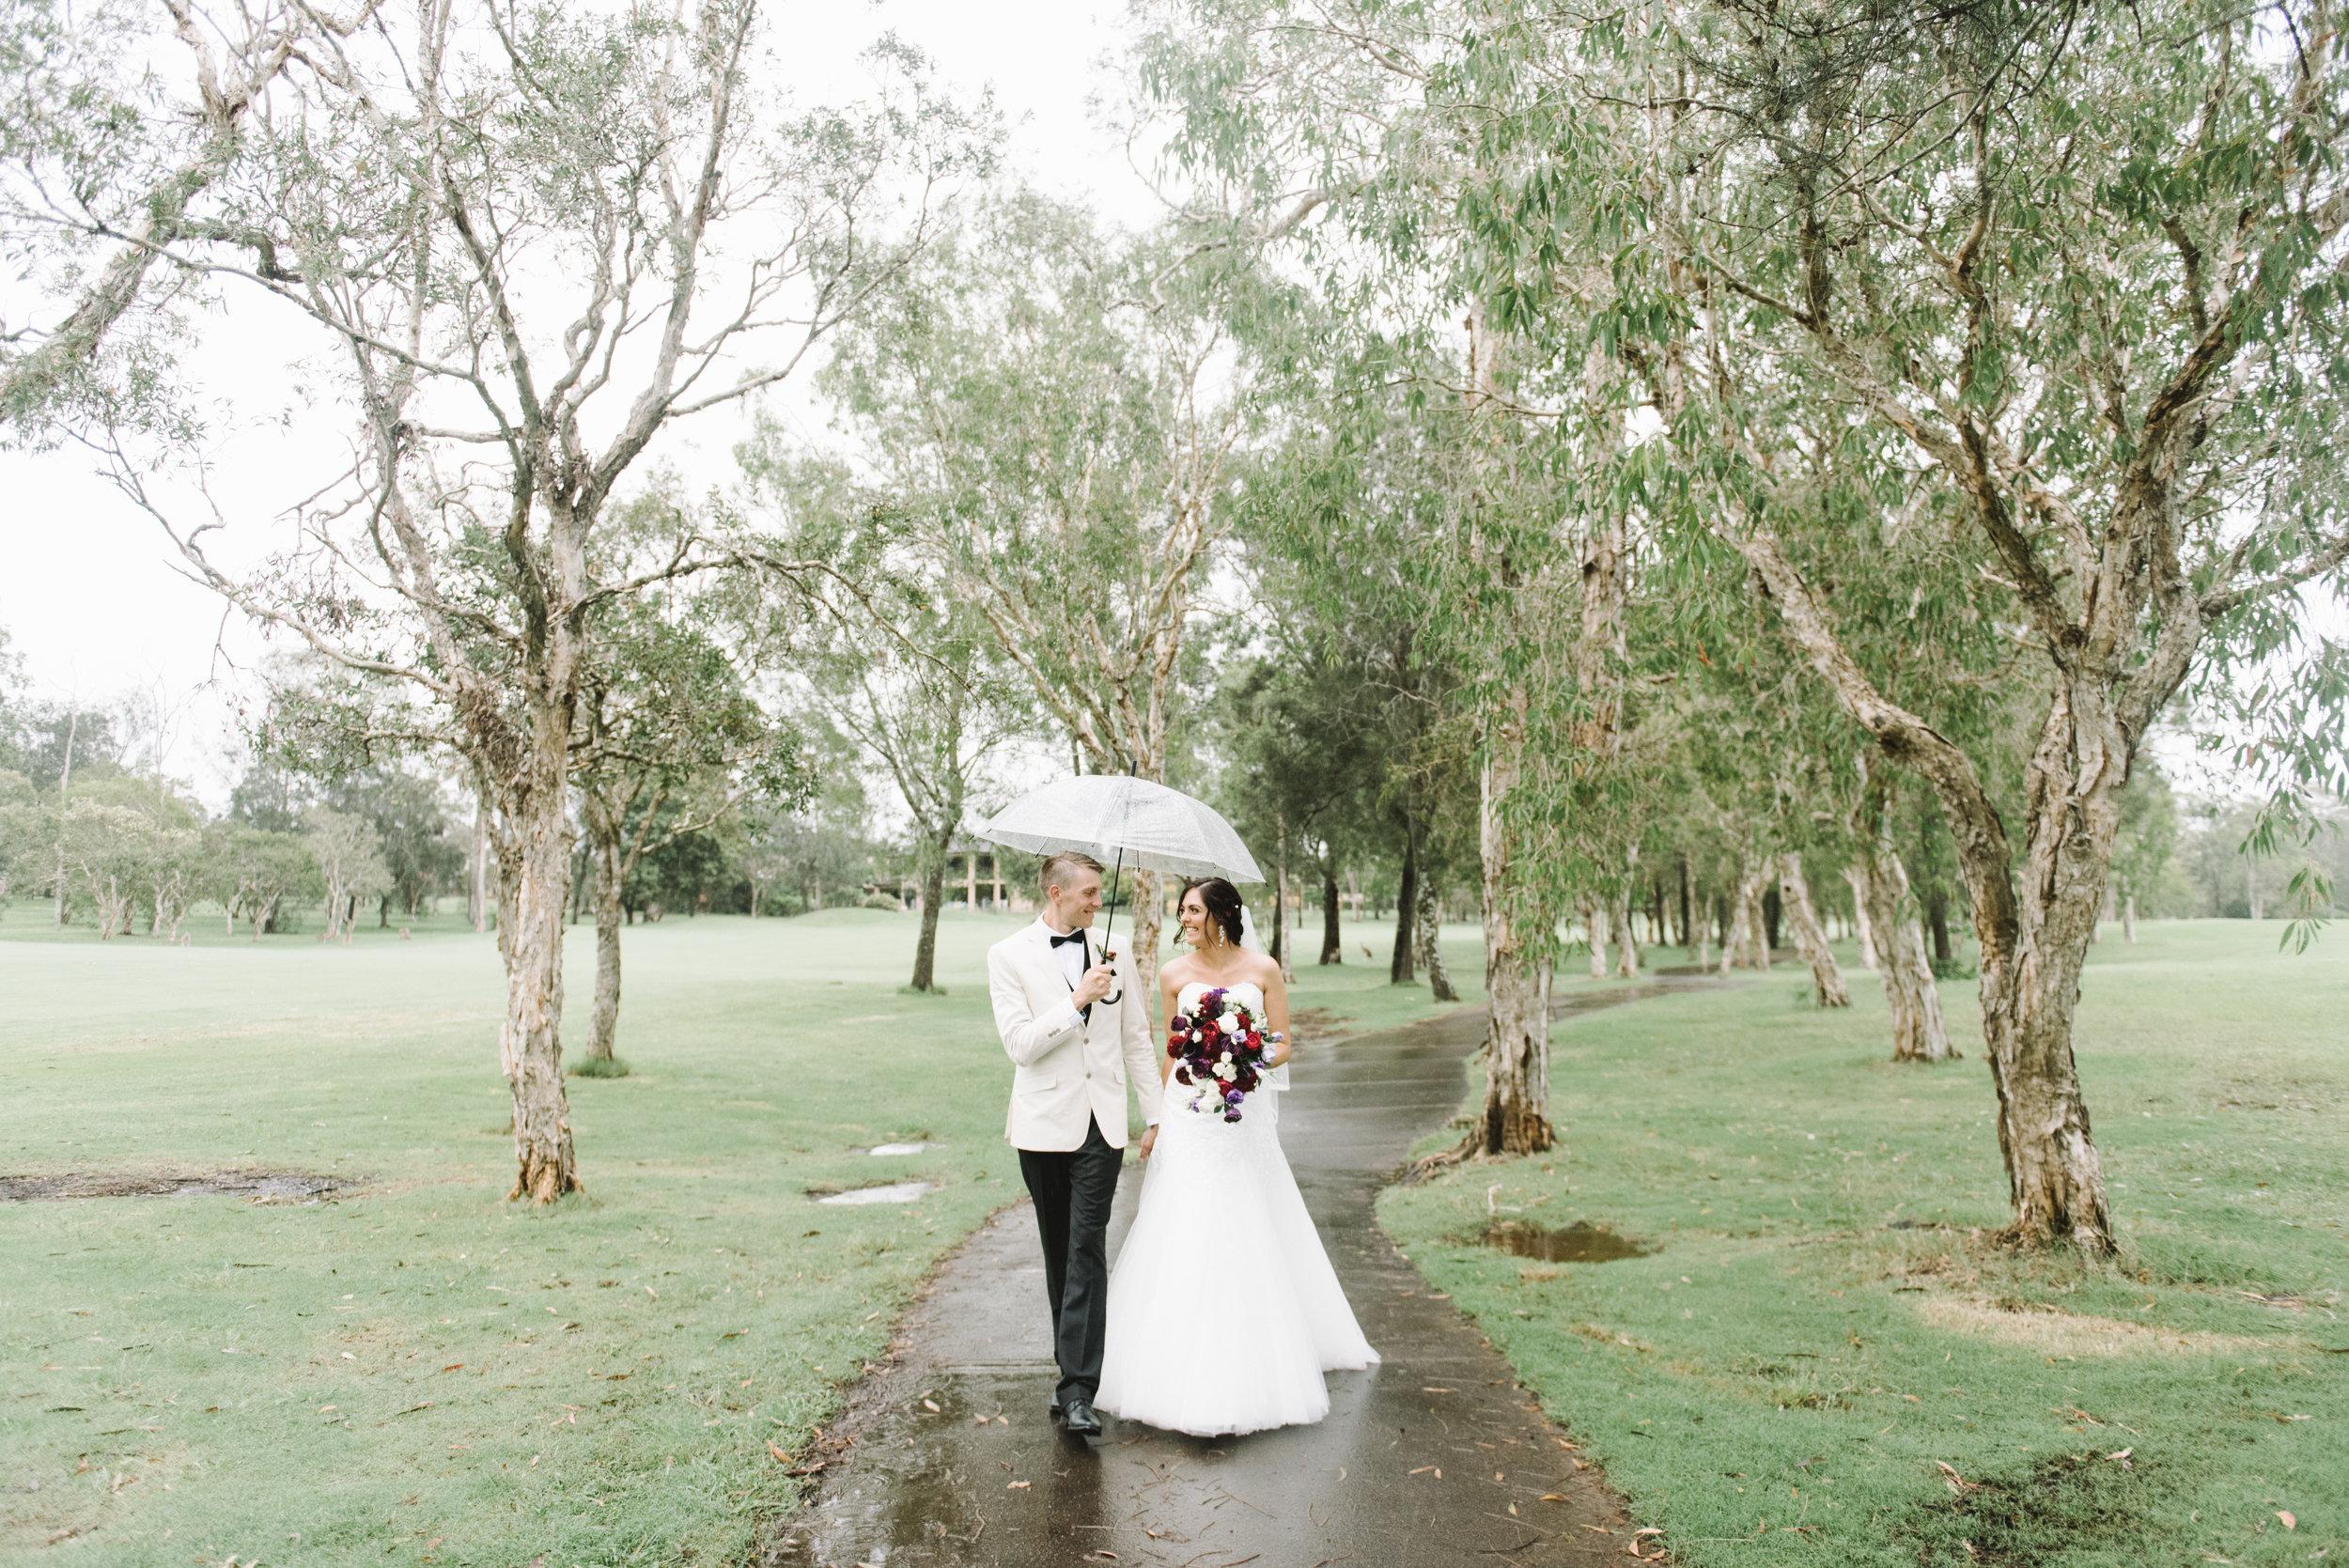 Gold-Coast-Arundel-Hills-Country-Club-Wedding-Photography-32.jpg